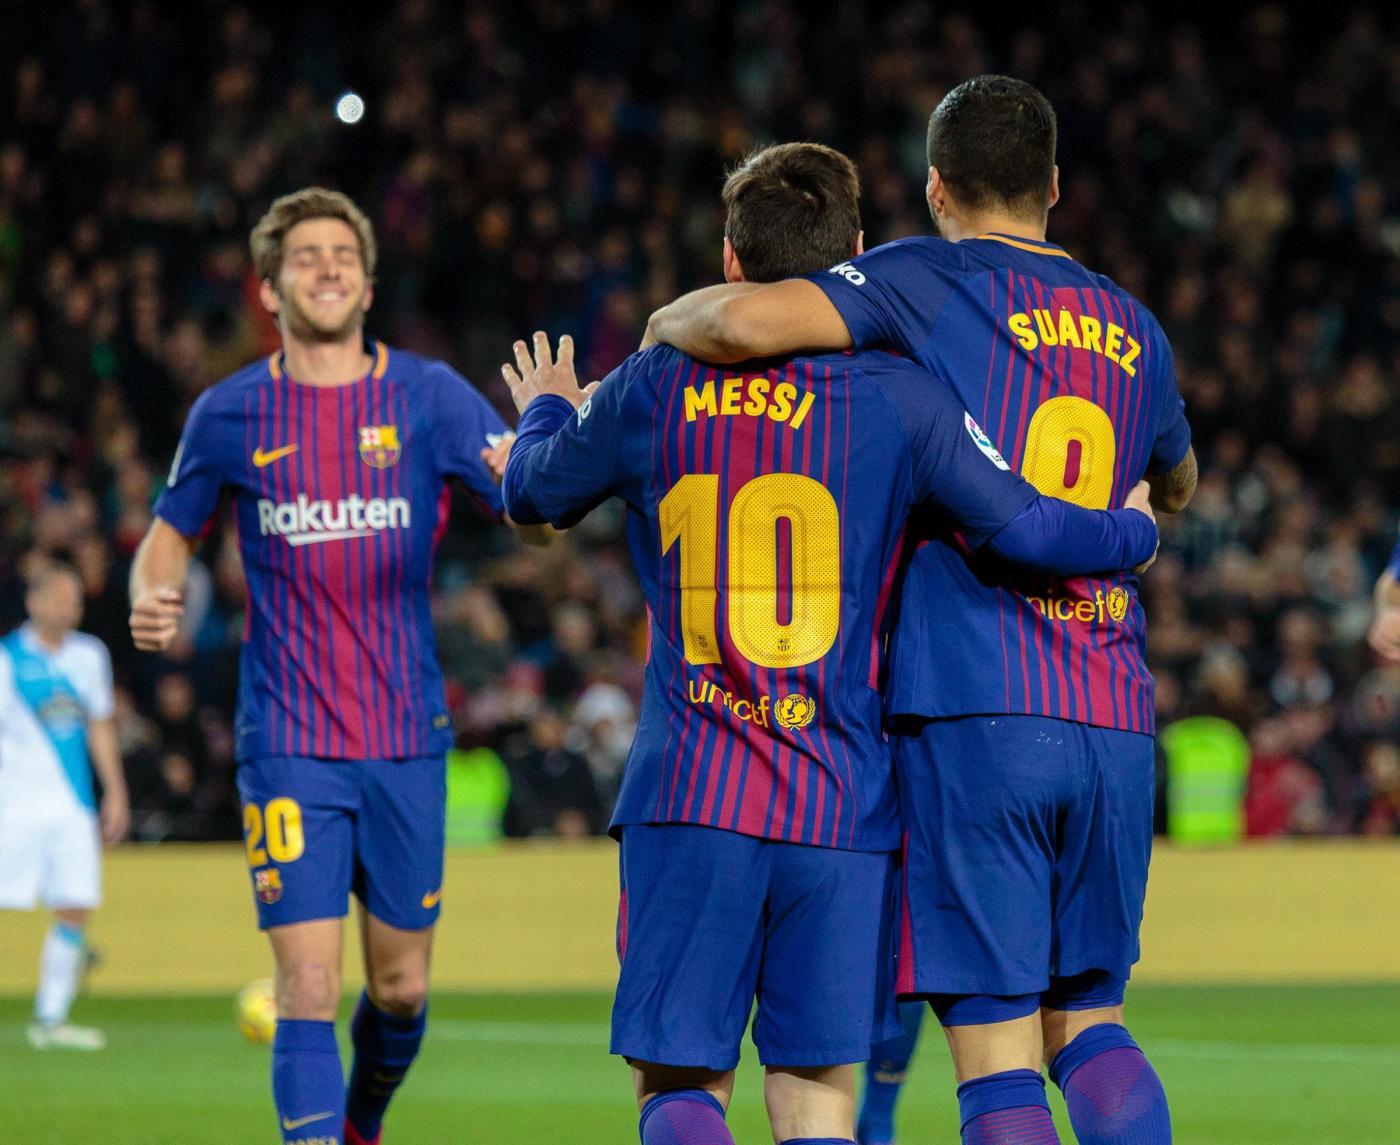 Barcellona-De Jong: l'Ajax spara alto per il centrocampista